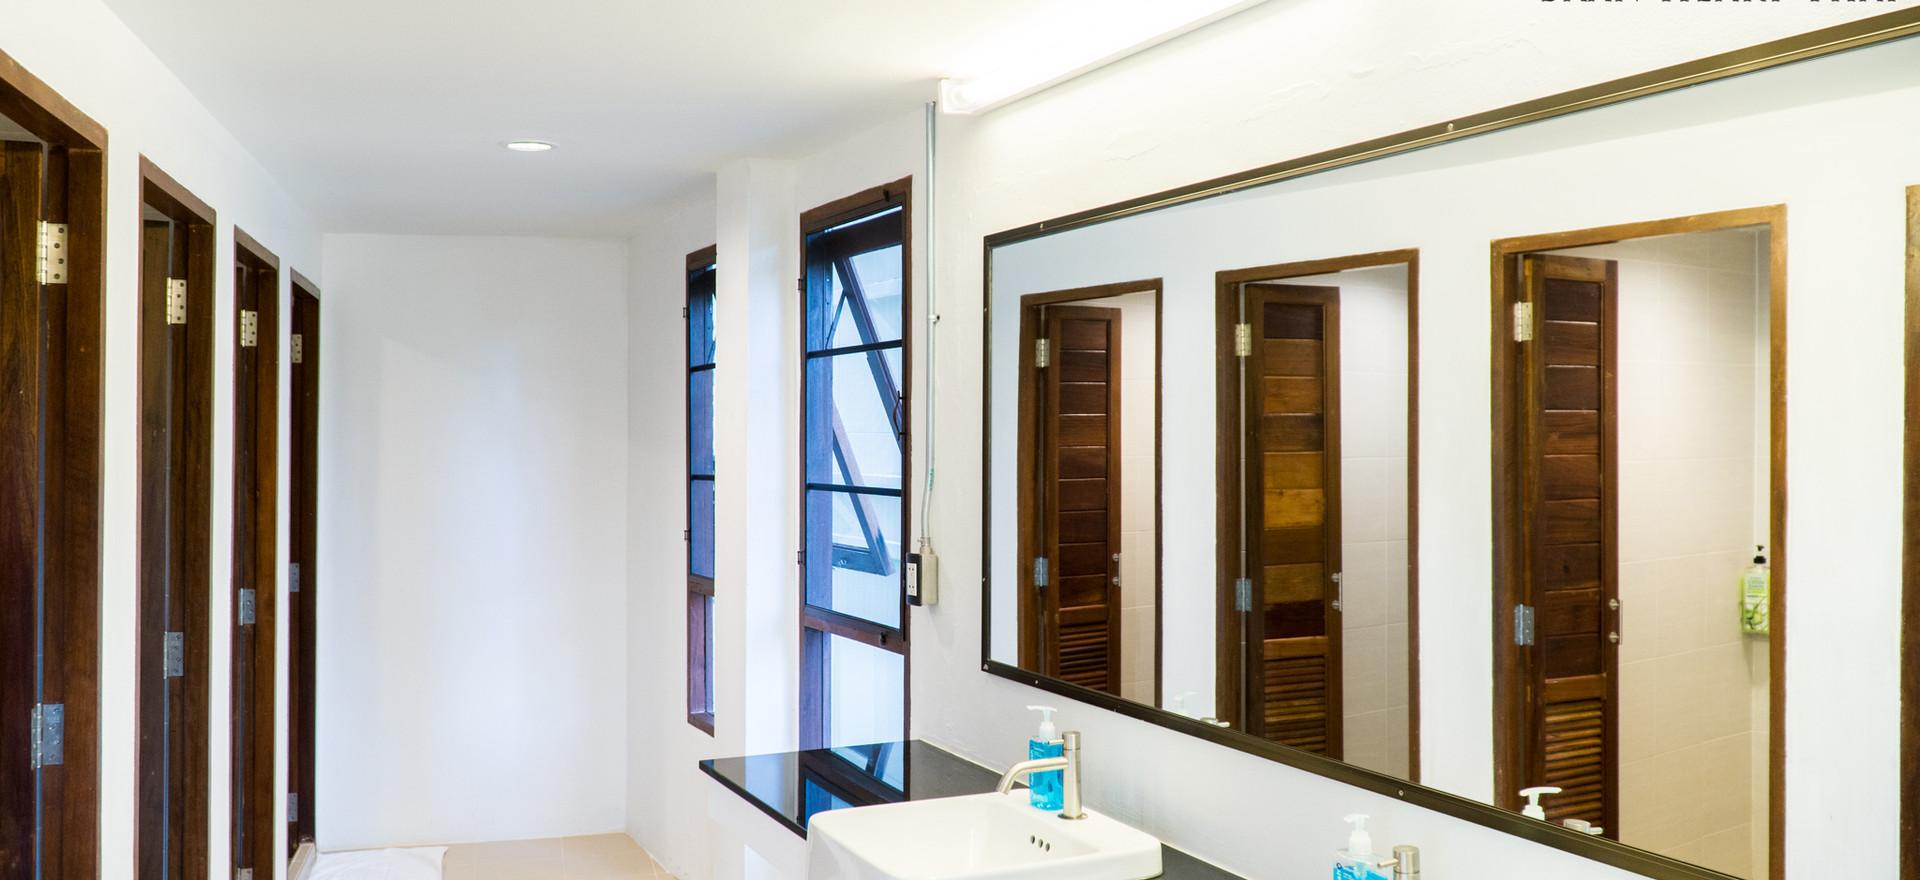 10 Beds Female Dorm Bathroom